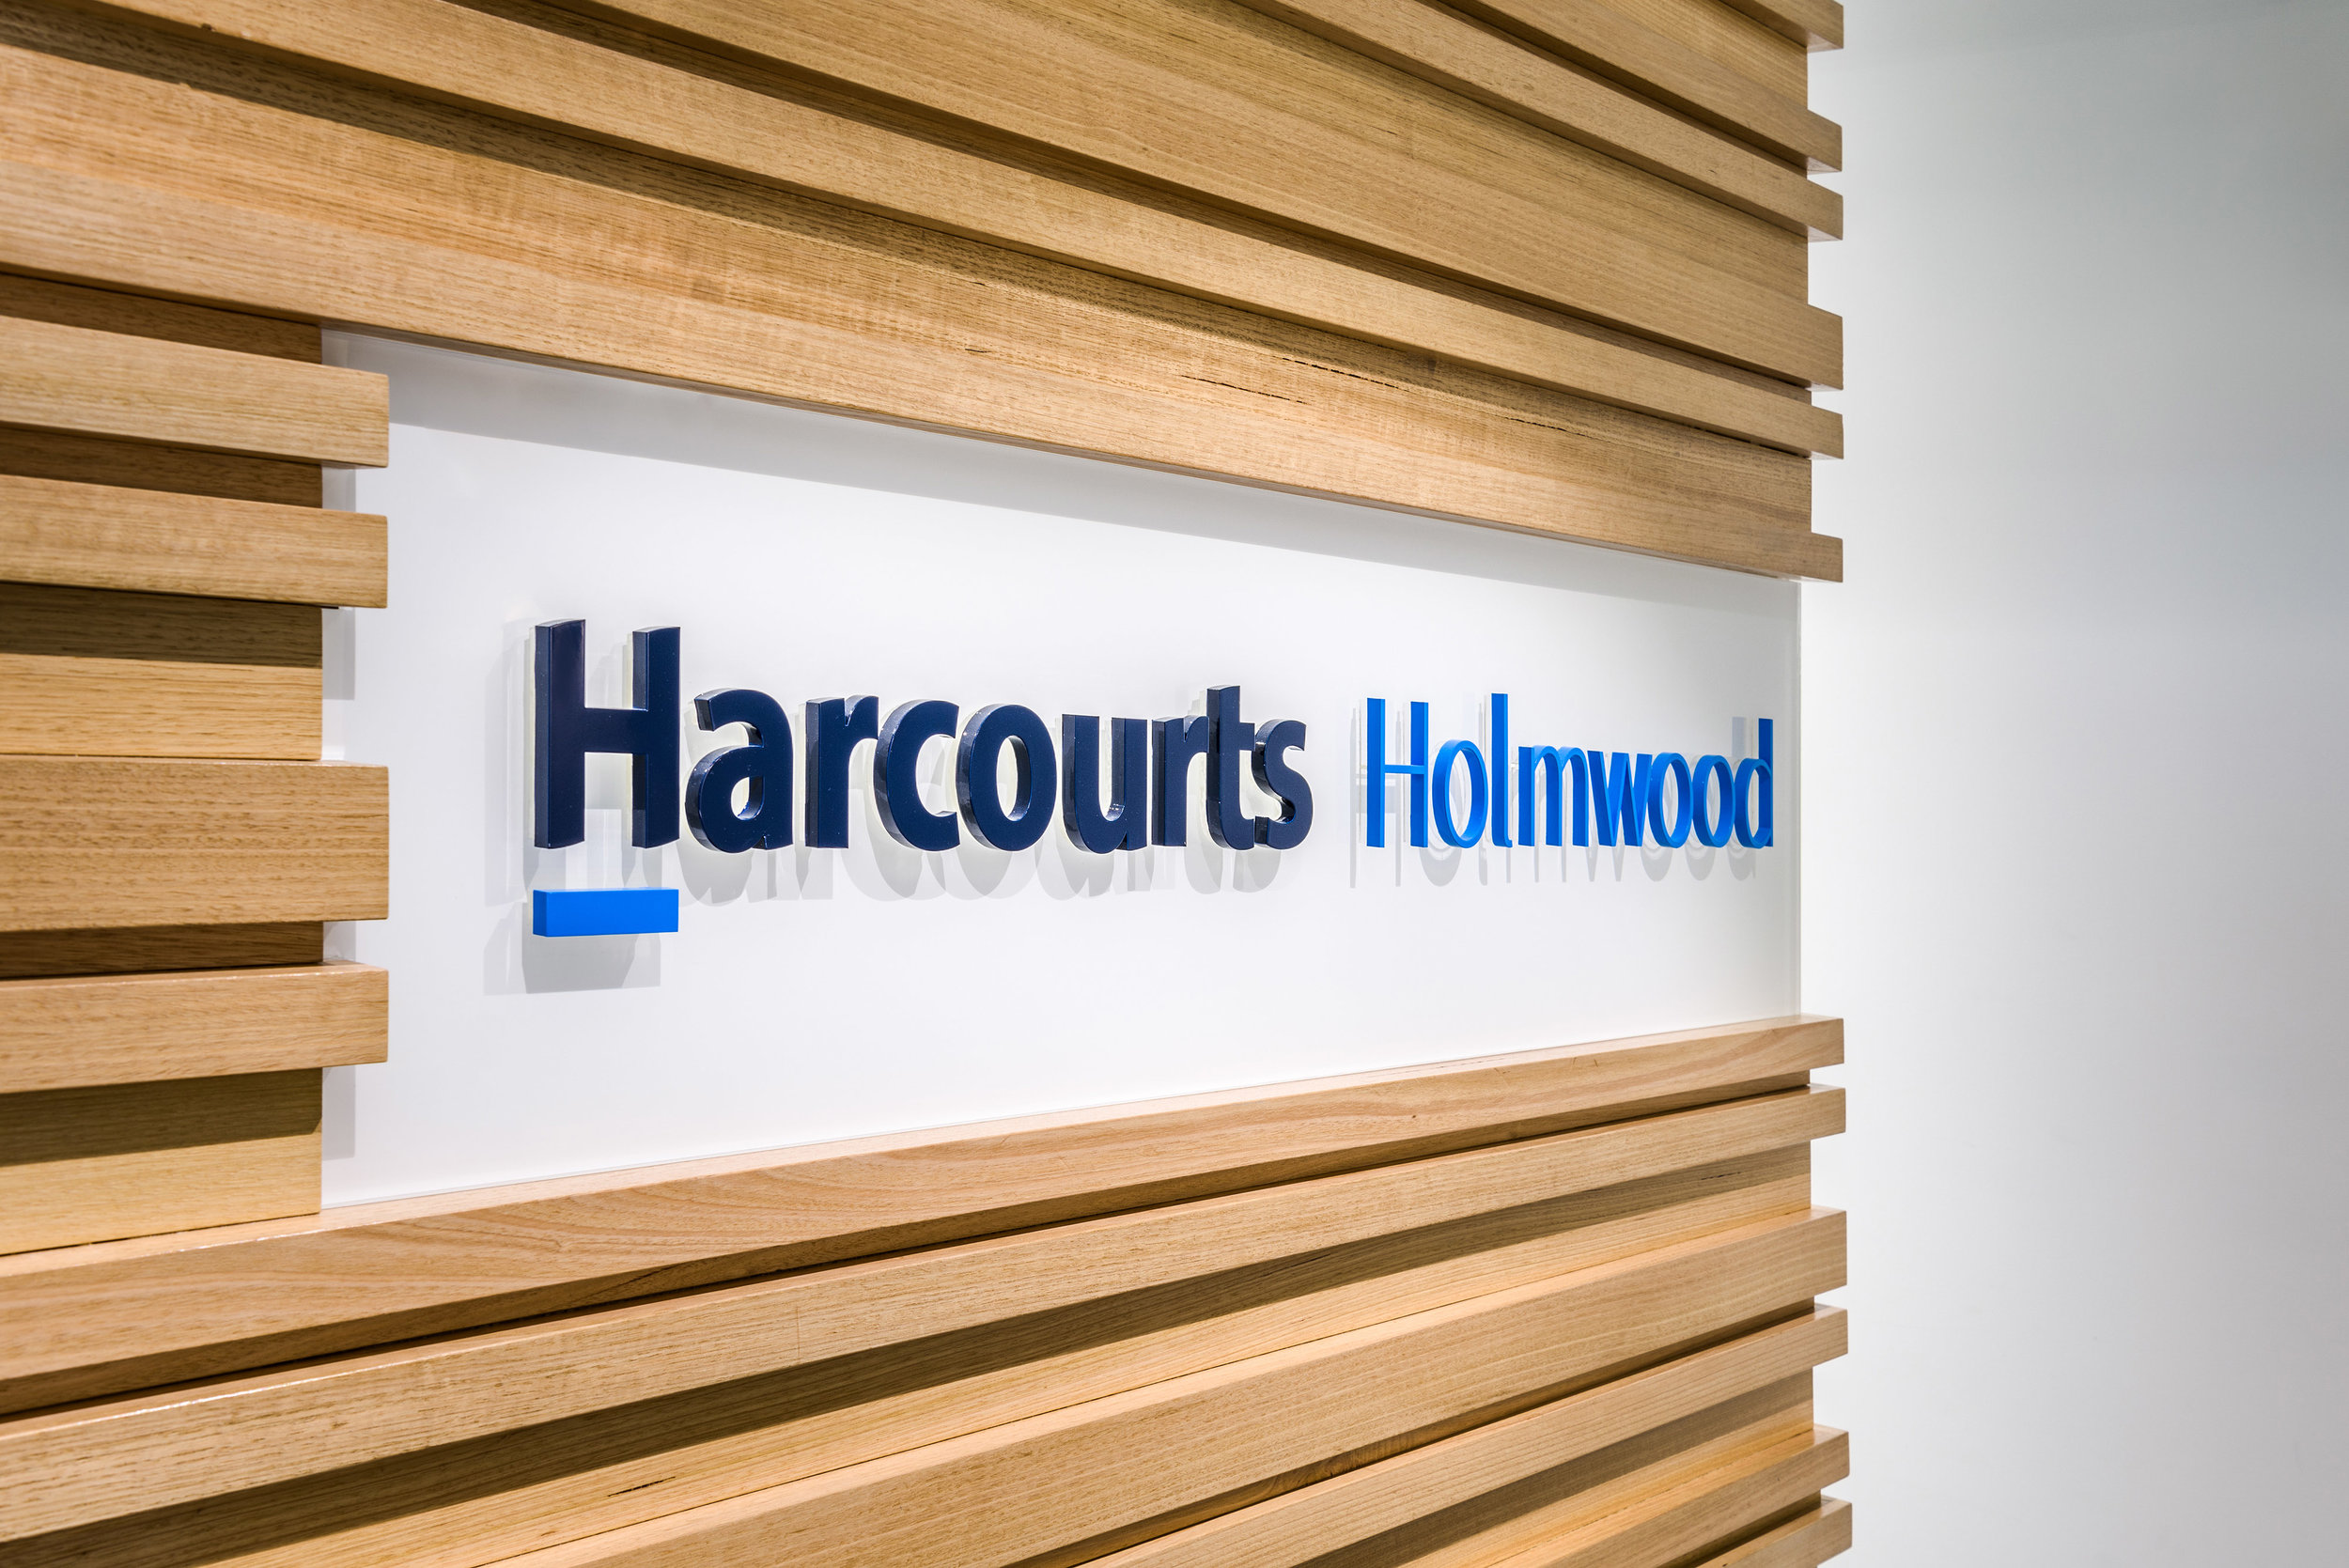 HHI12-Harcourts-Holmwood-Int-Stufkens.jpg